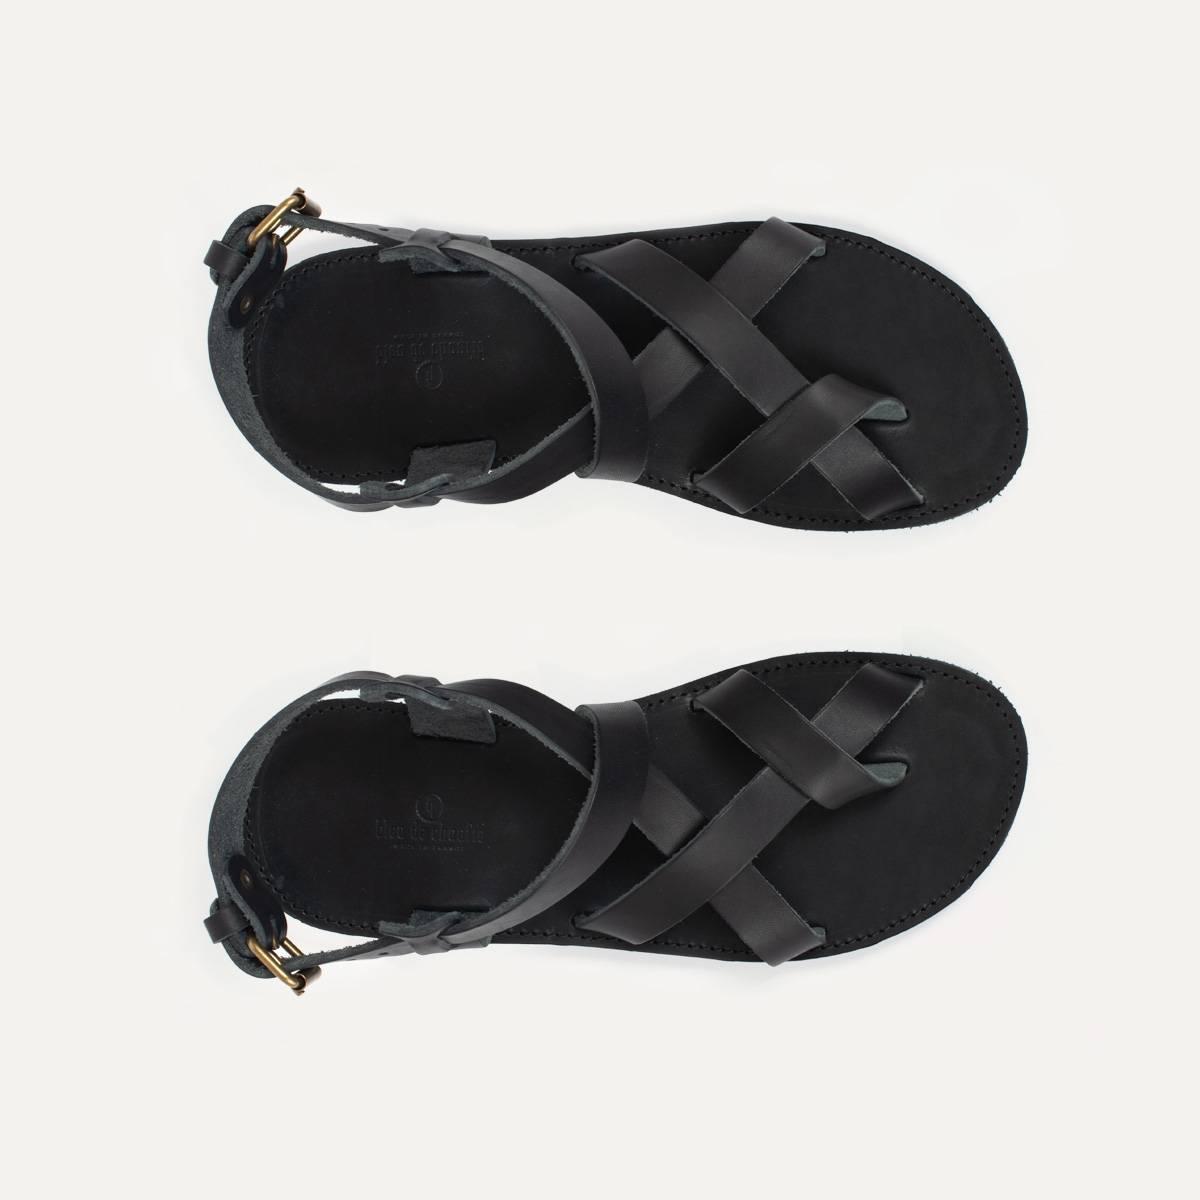 Lhassa leather sandals - Black (image n°4)